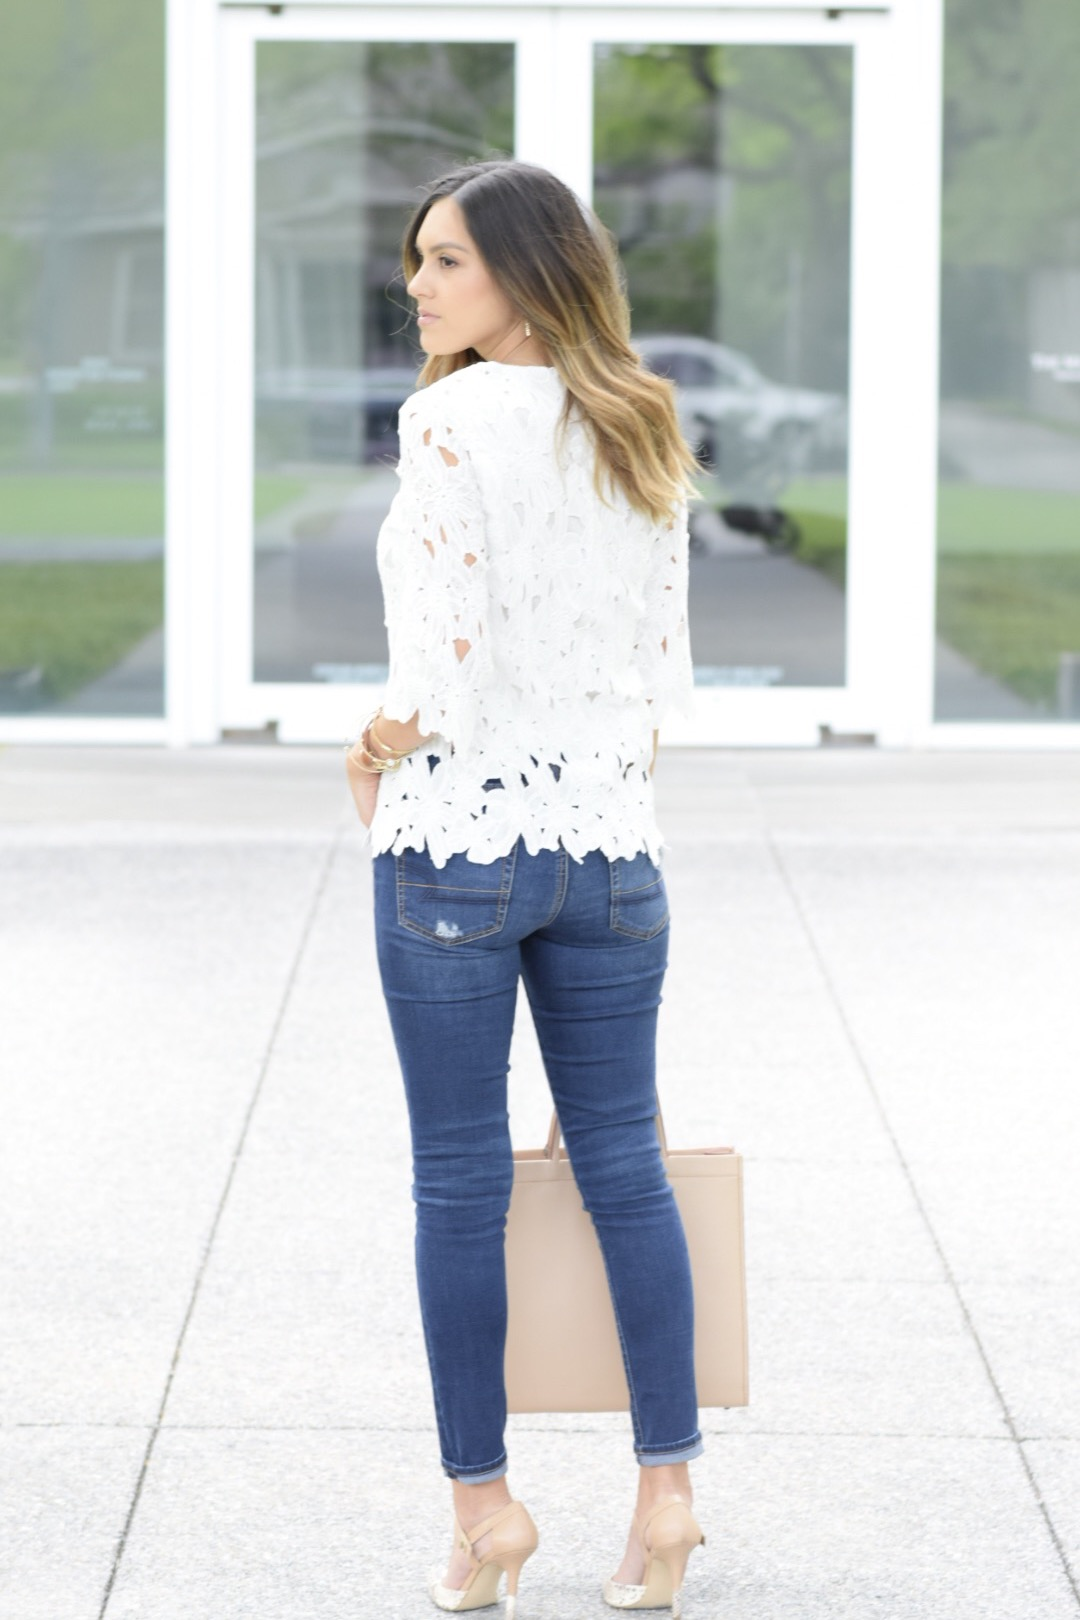 style the girl crochet blouse5